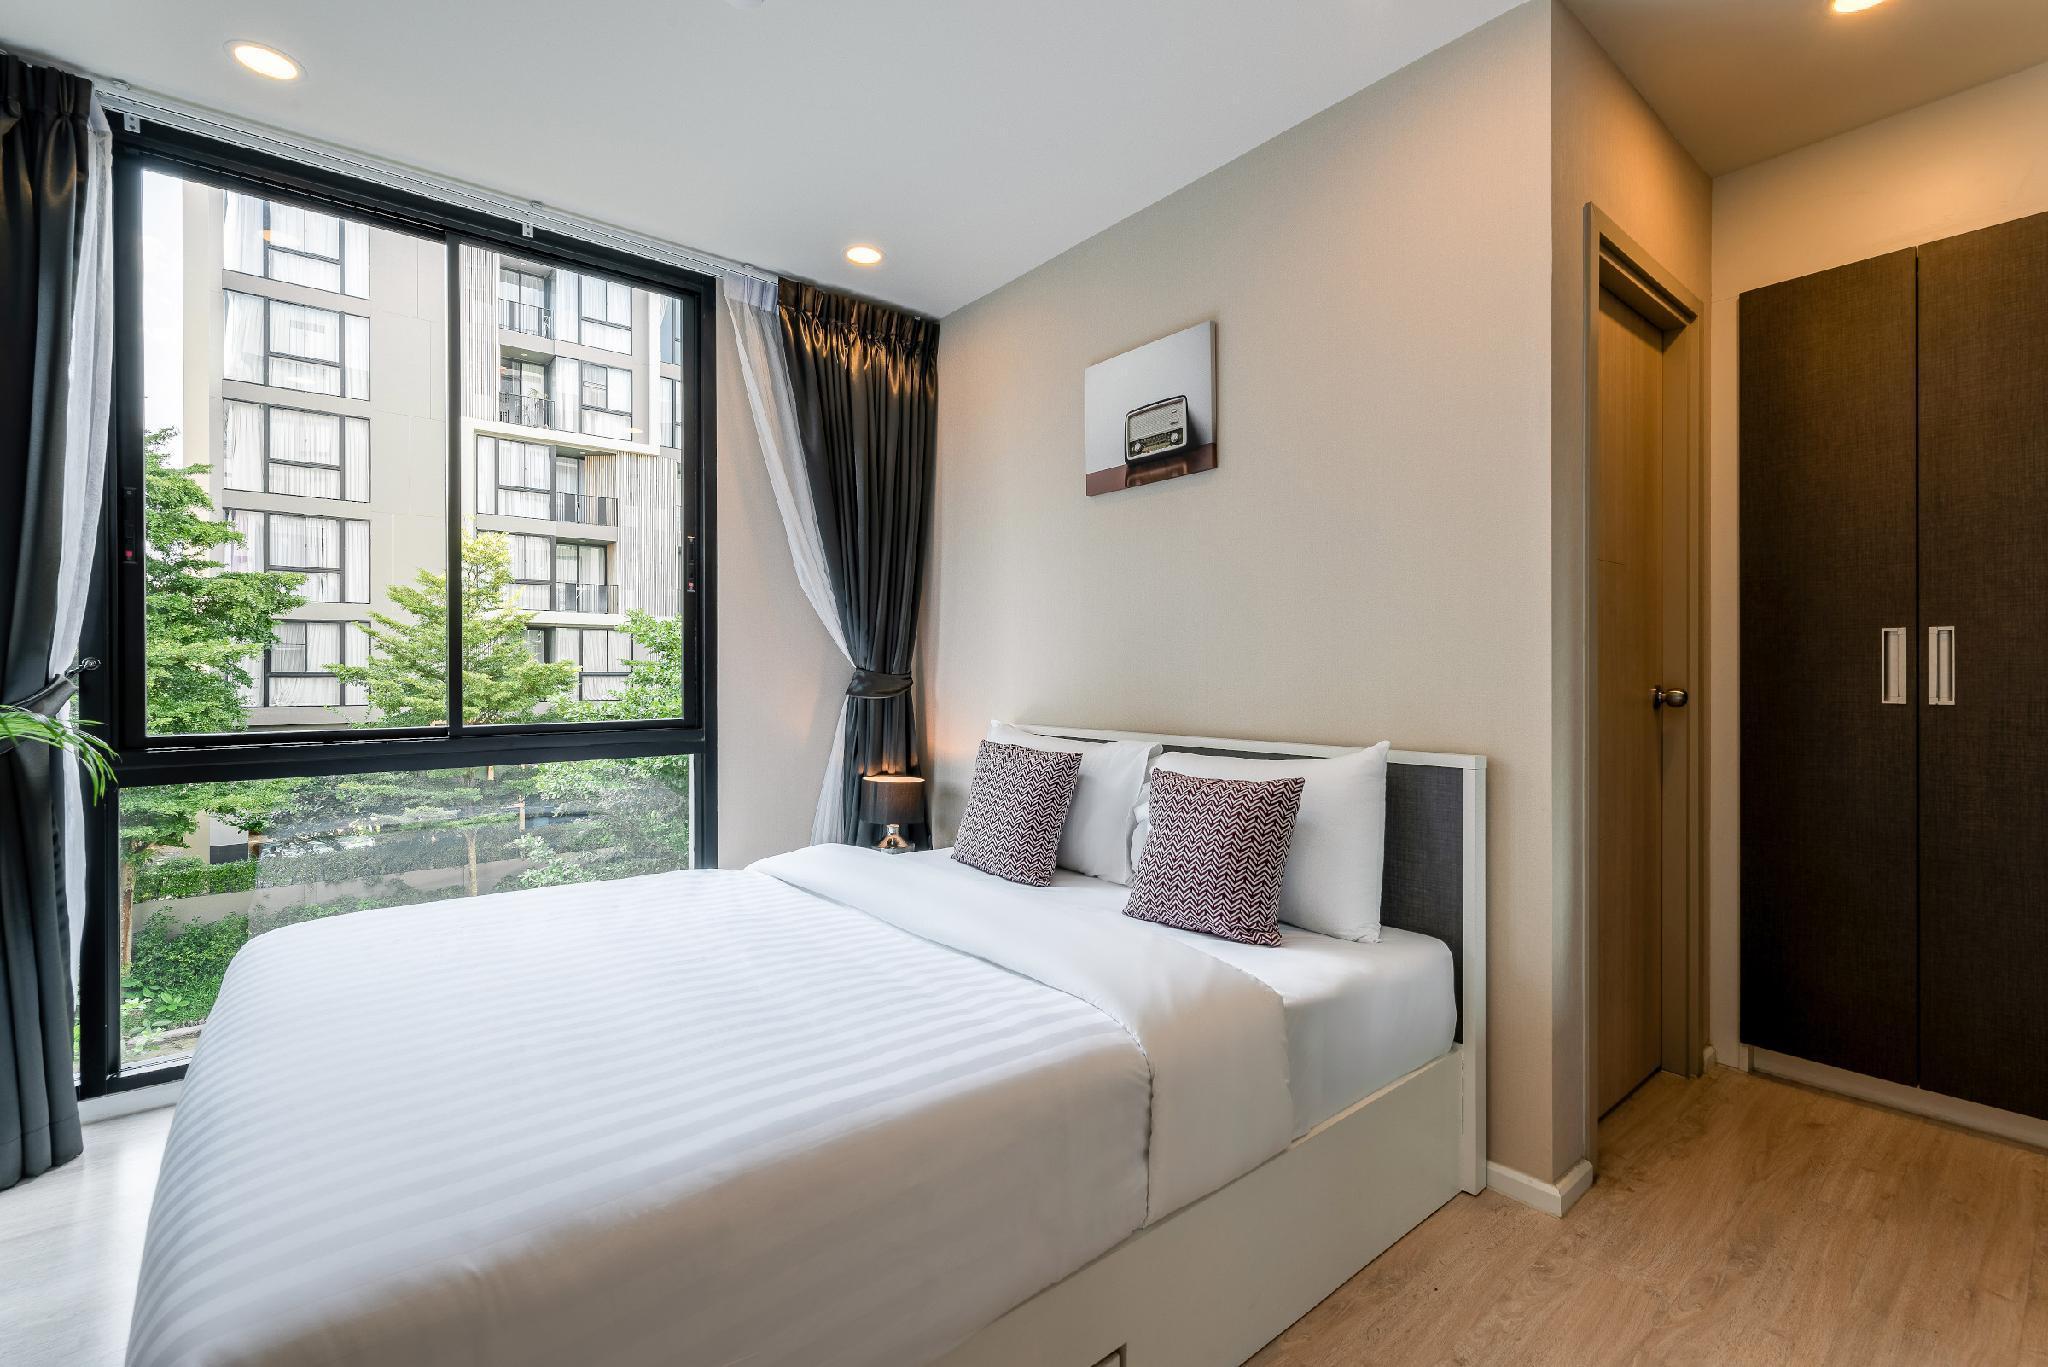 One Bedroom Suite In Nimman By Belcarra Spaces R31